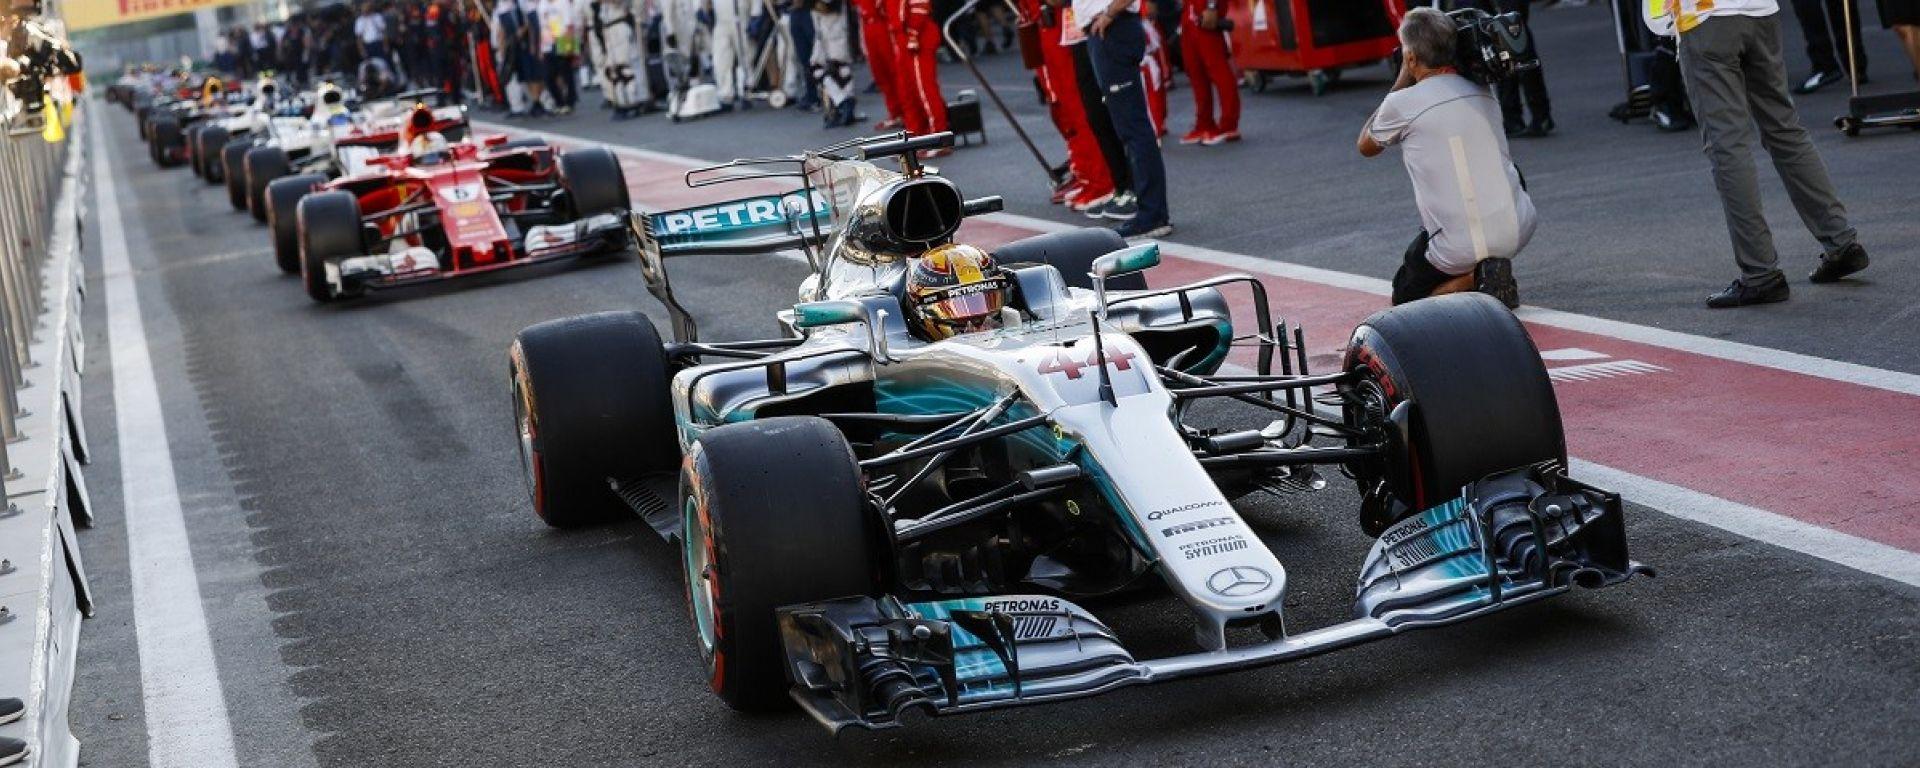 F1 2018 GP Azerbaijan